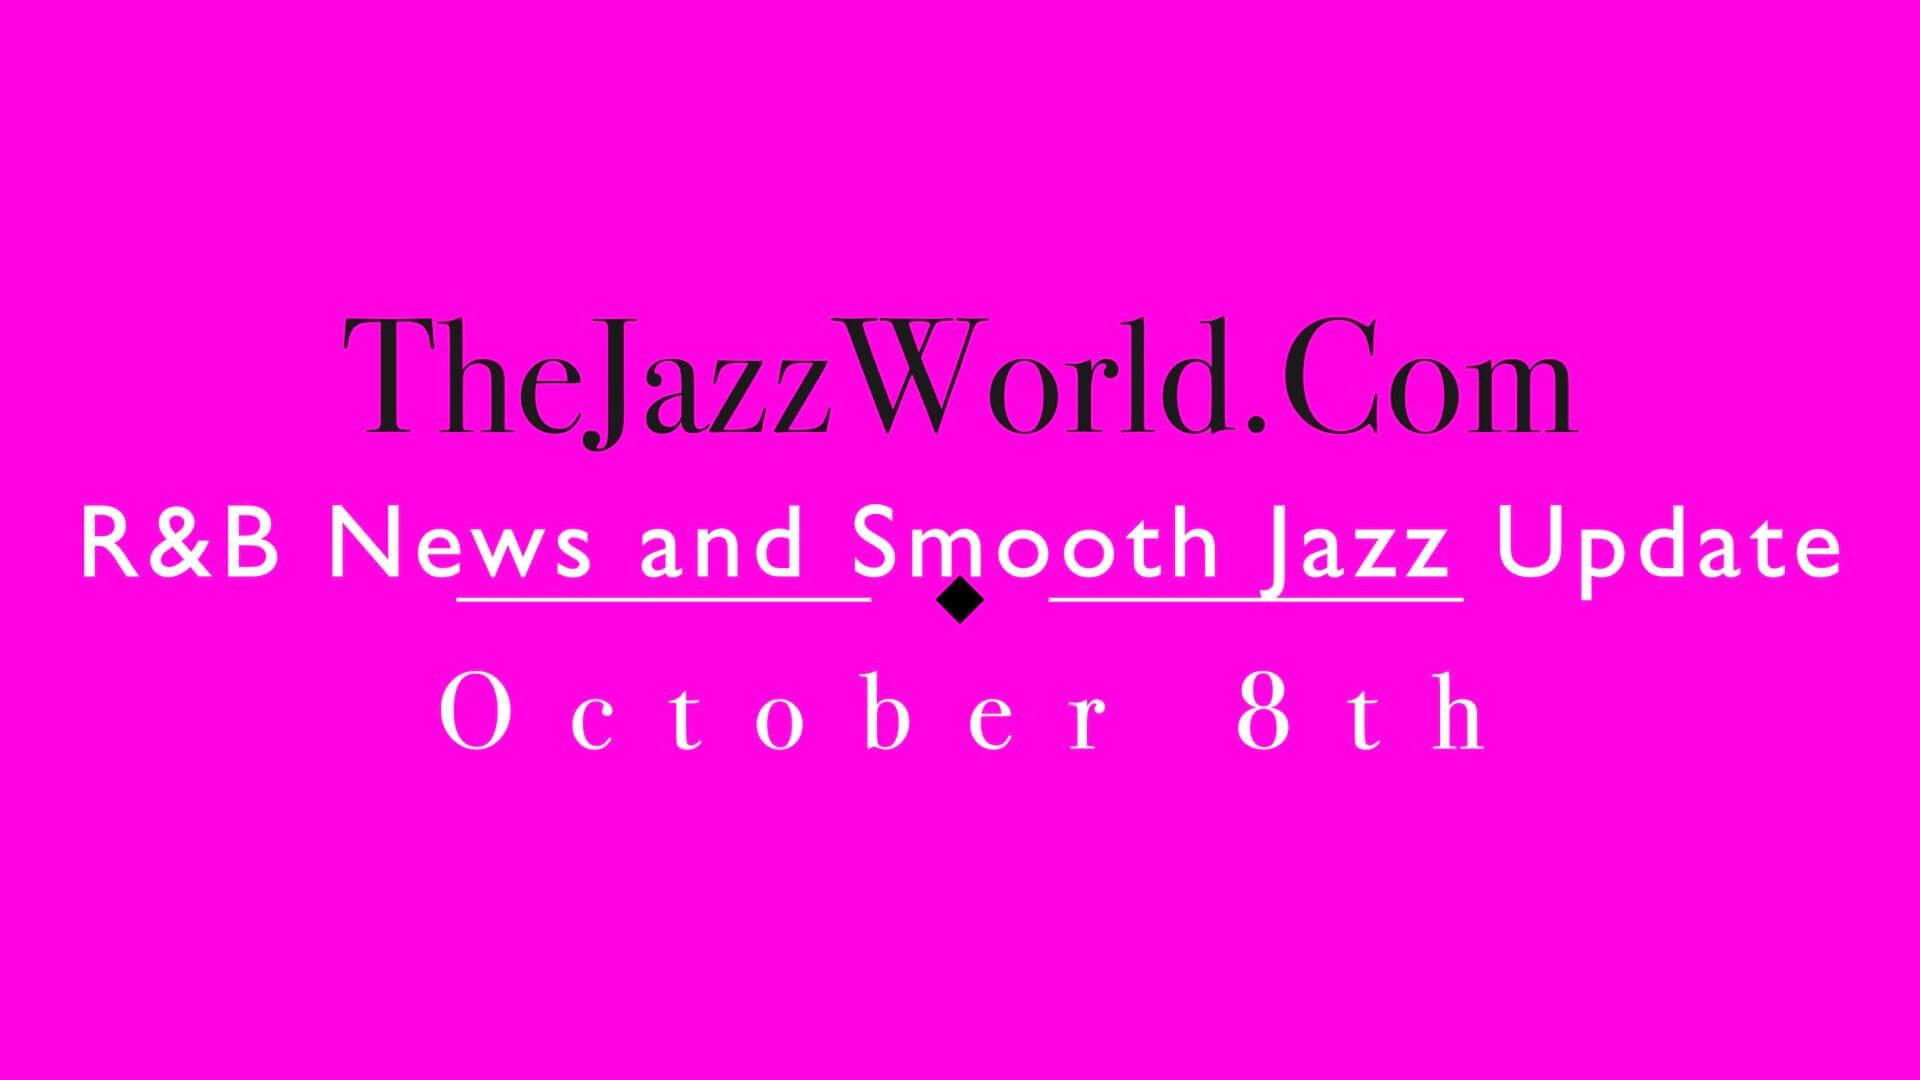 The Jazz World Show 10:8